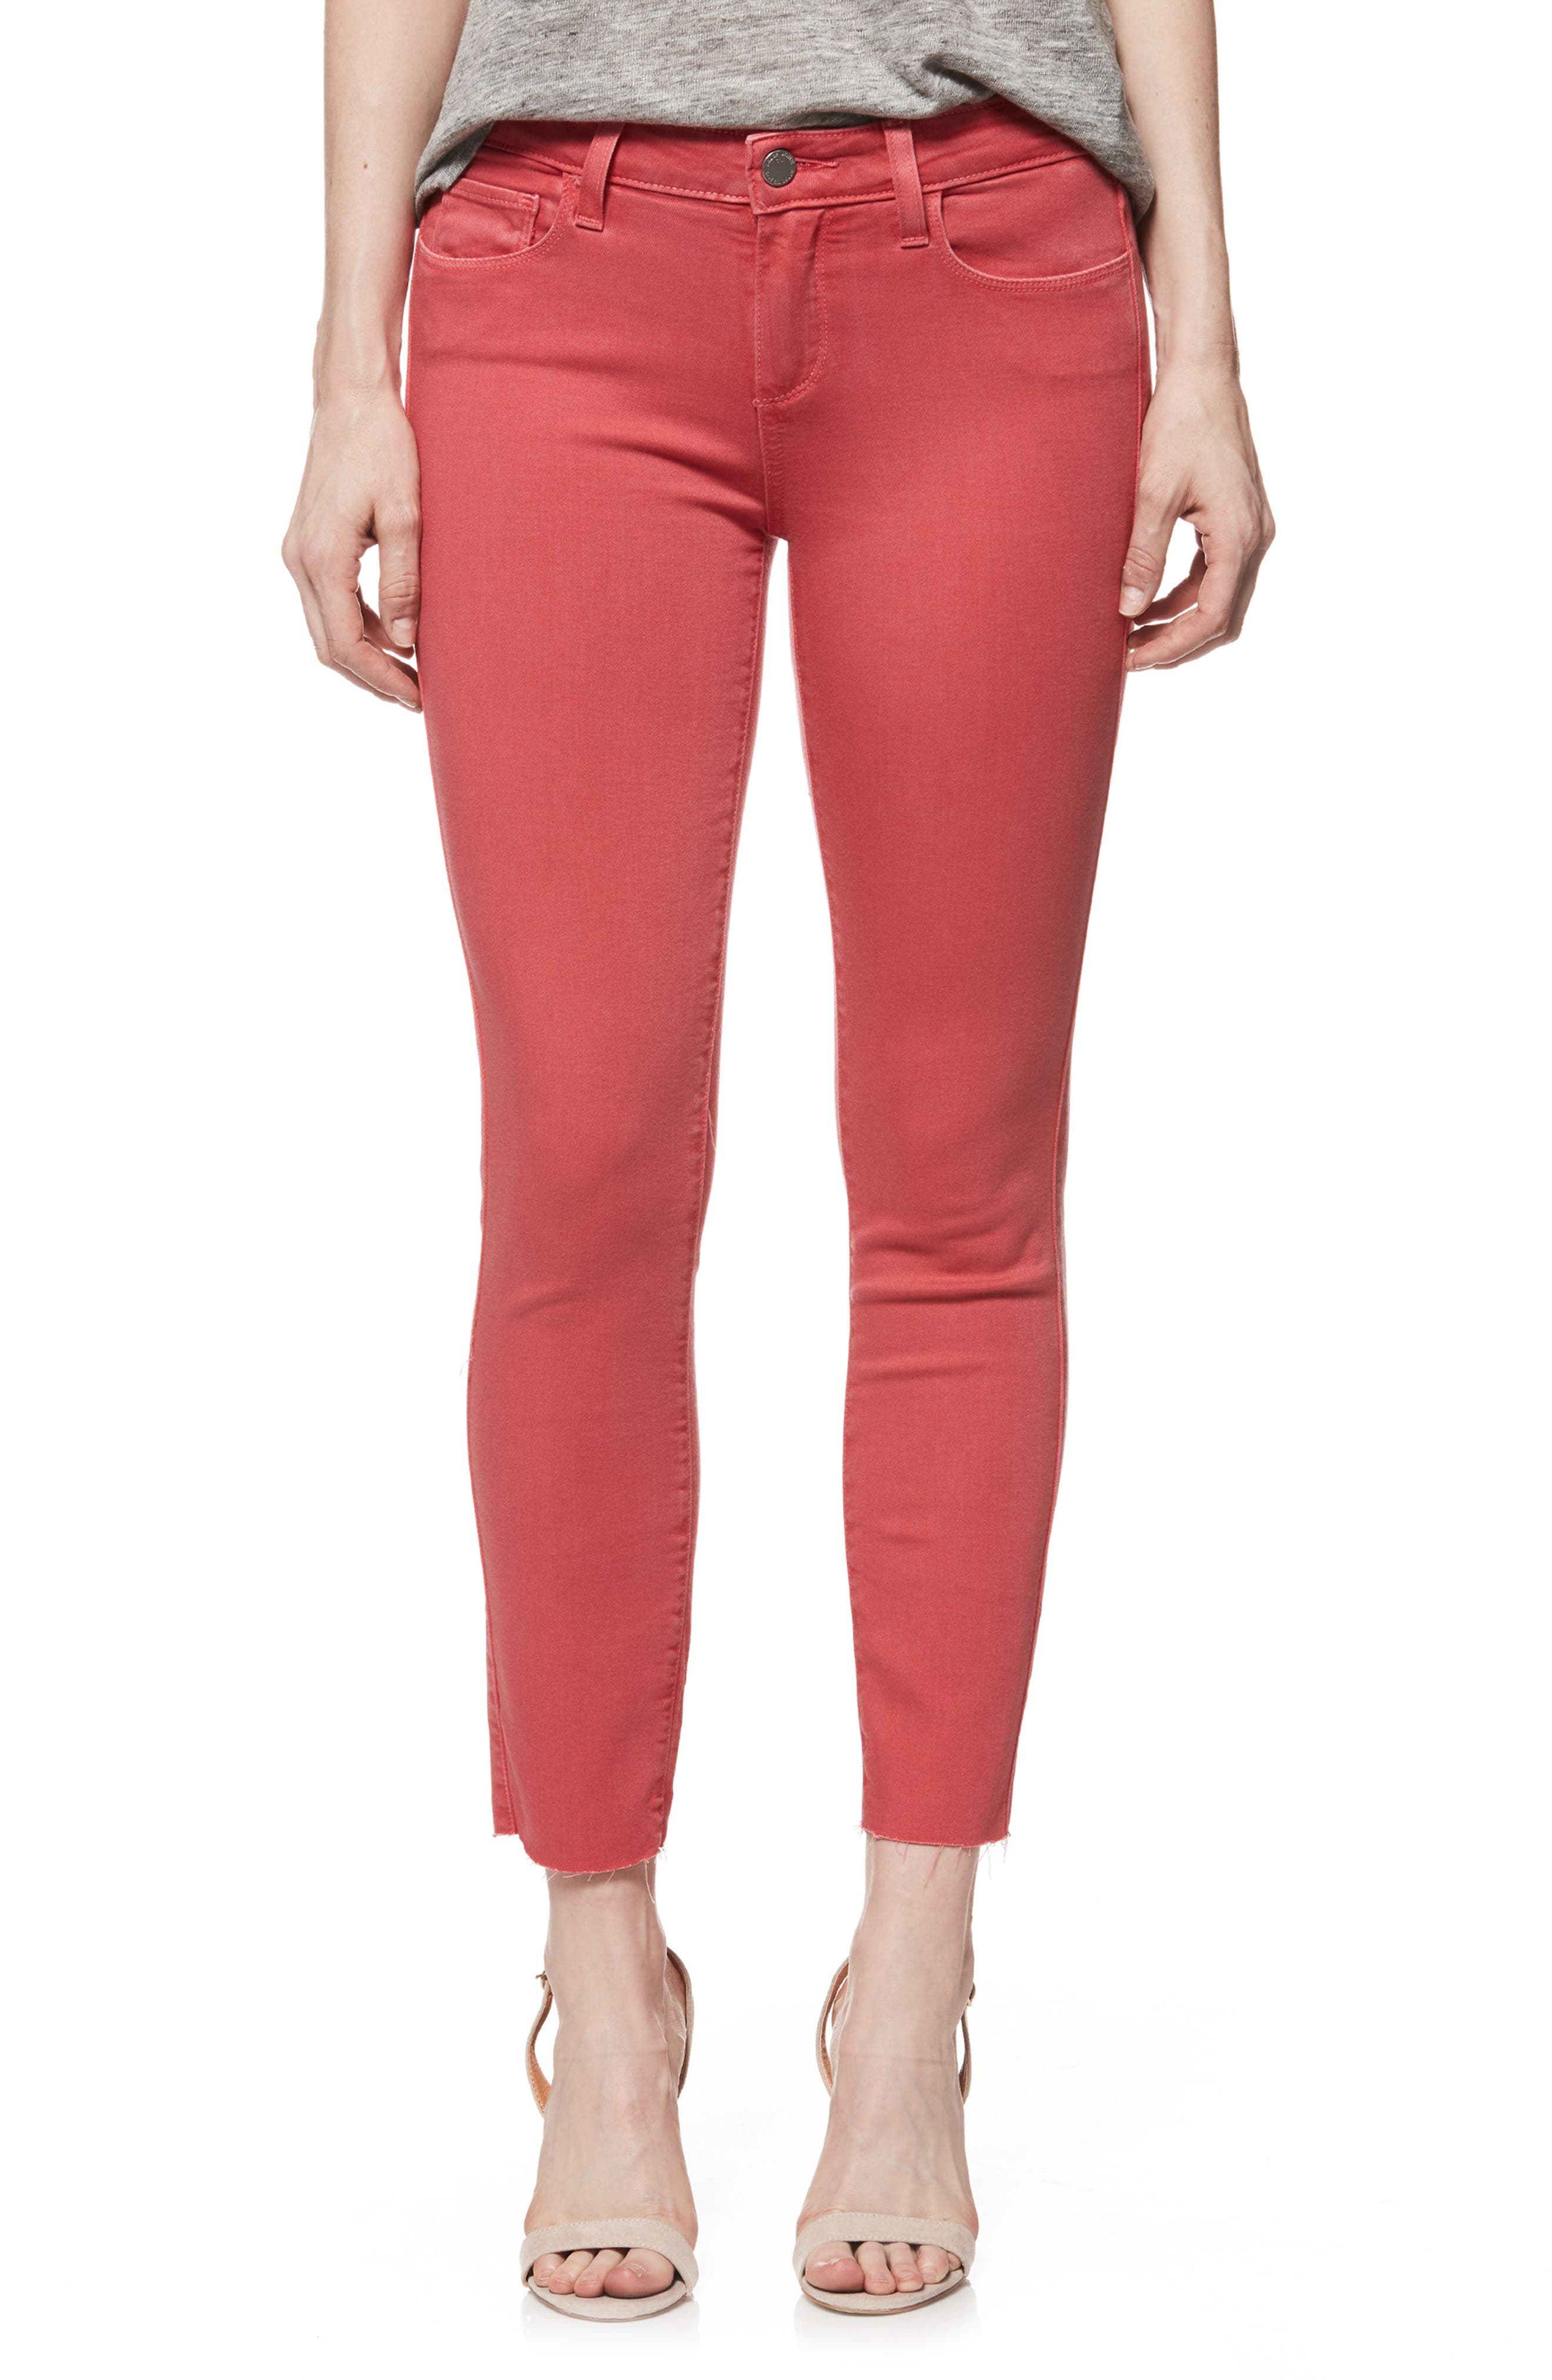 Transcend - Verdugo Raw Hem Crop Skinny Jeans,                             Main thumbnail 1, color,                             601